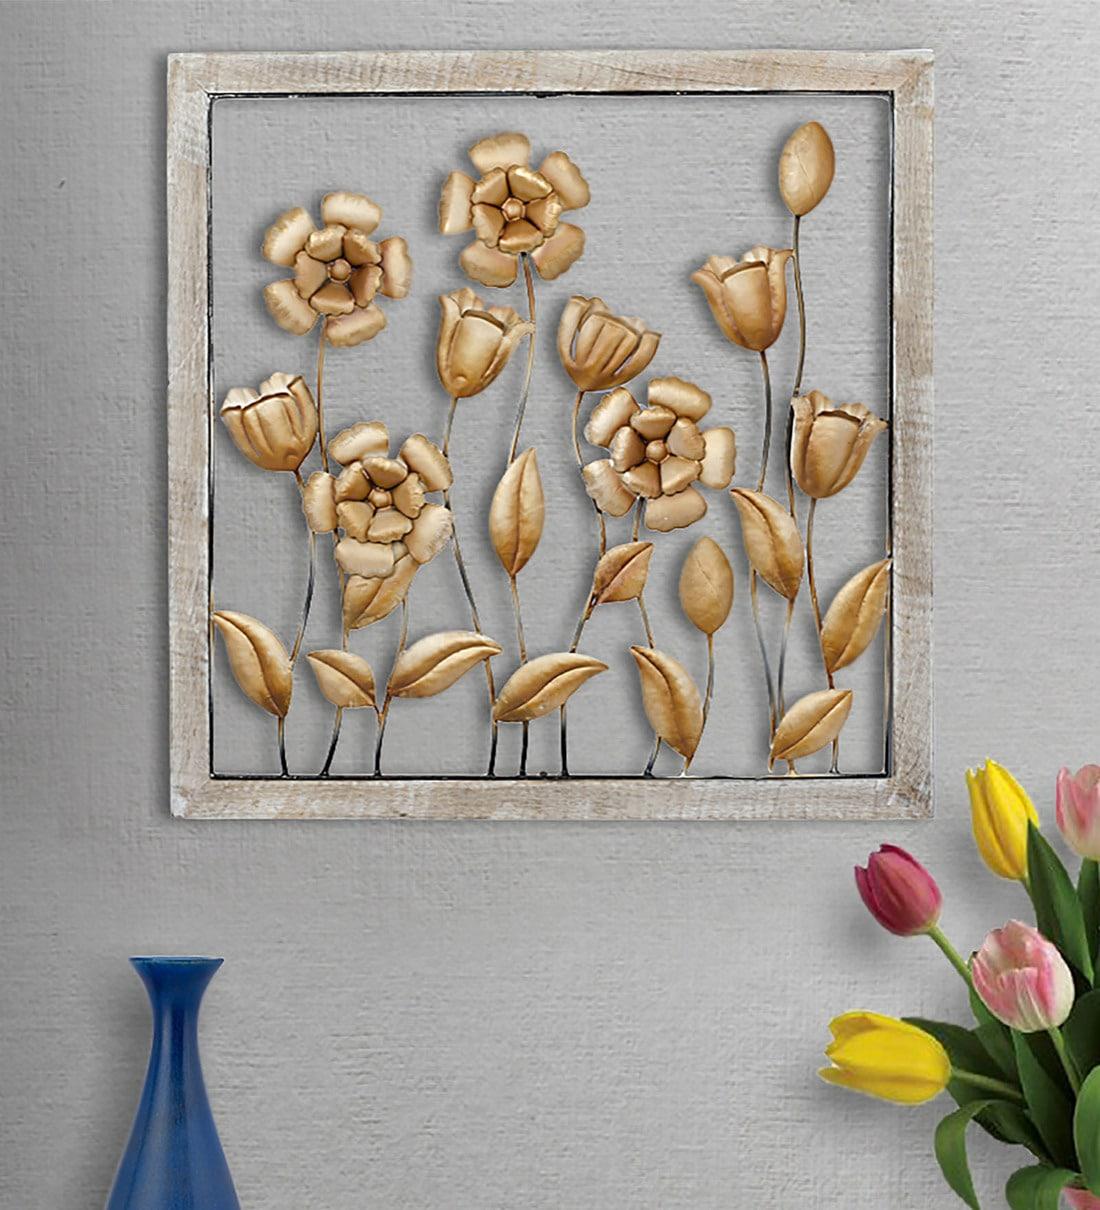 Buy Gold Metal Flower Wall Decor